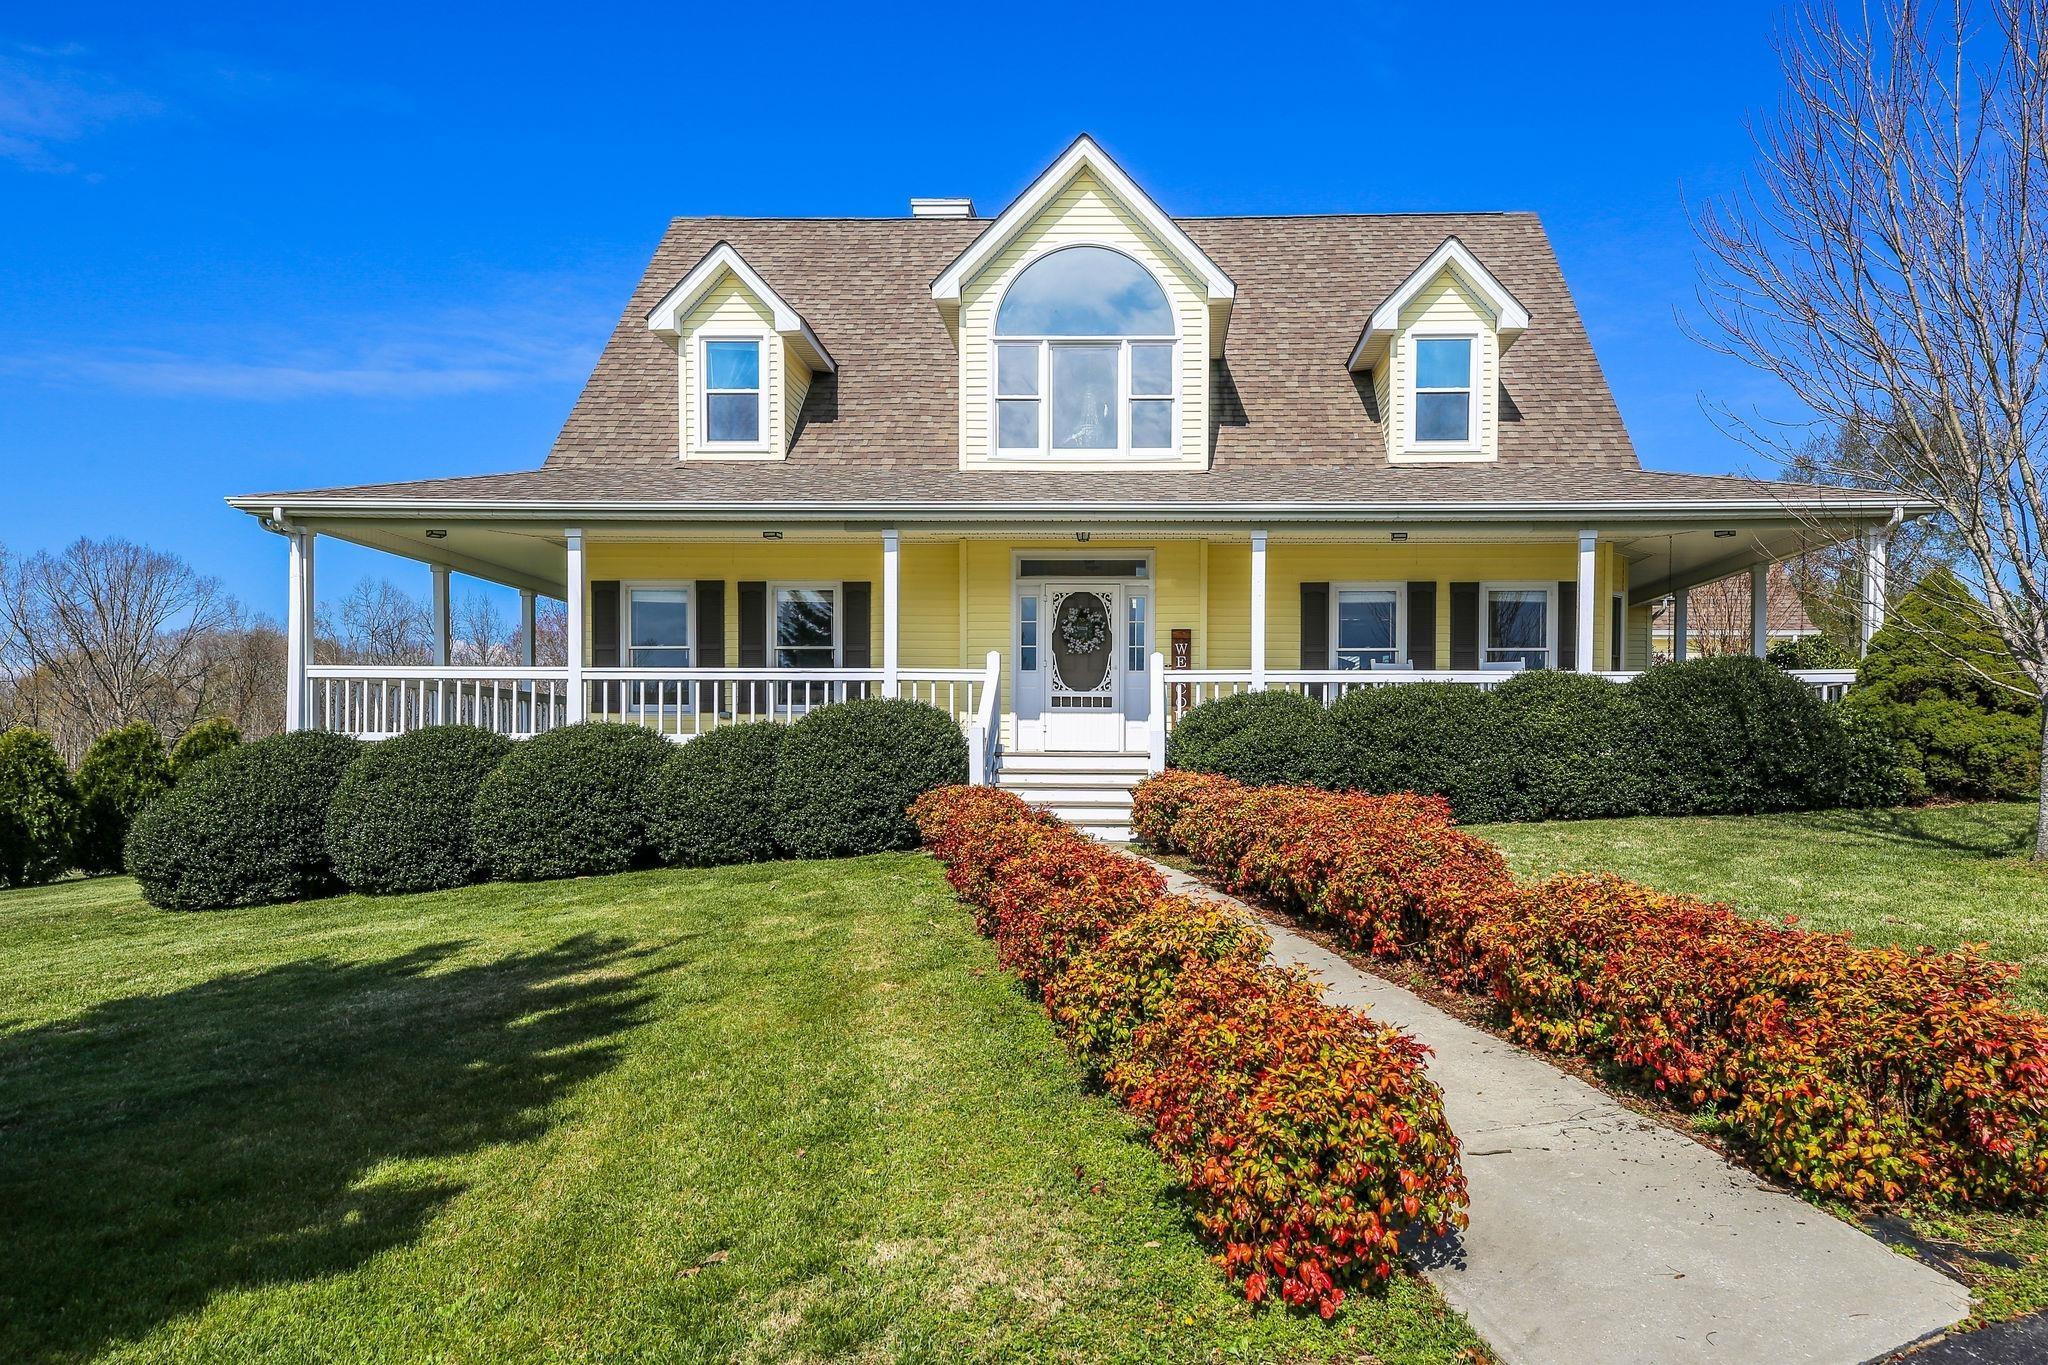 448 Wilson Ln, Mc Minnville, TN 37110 - Mc Minnville, TN real estate listing